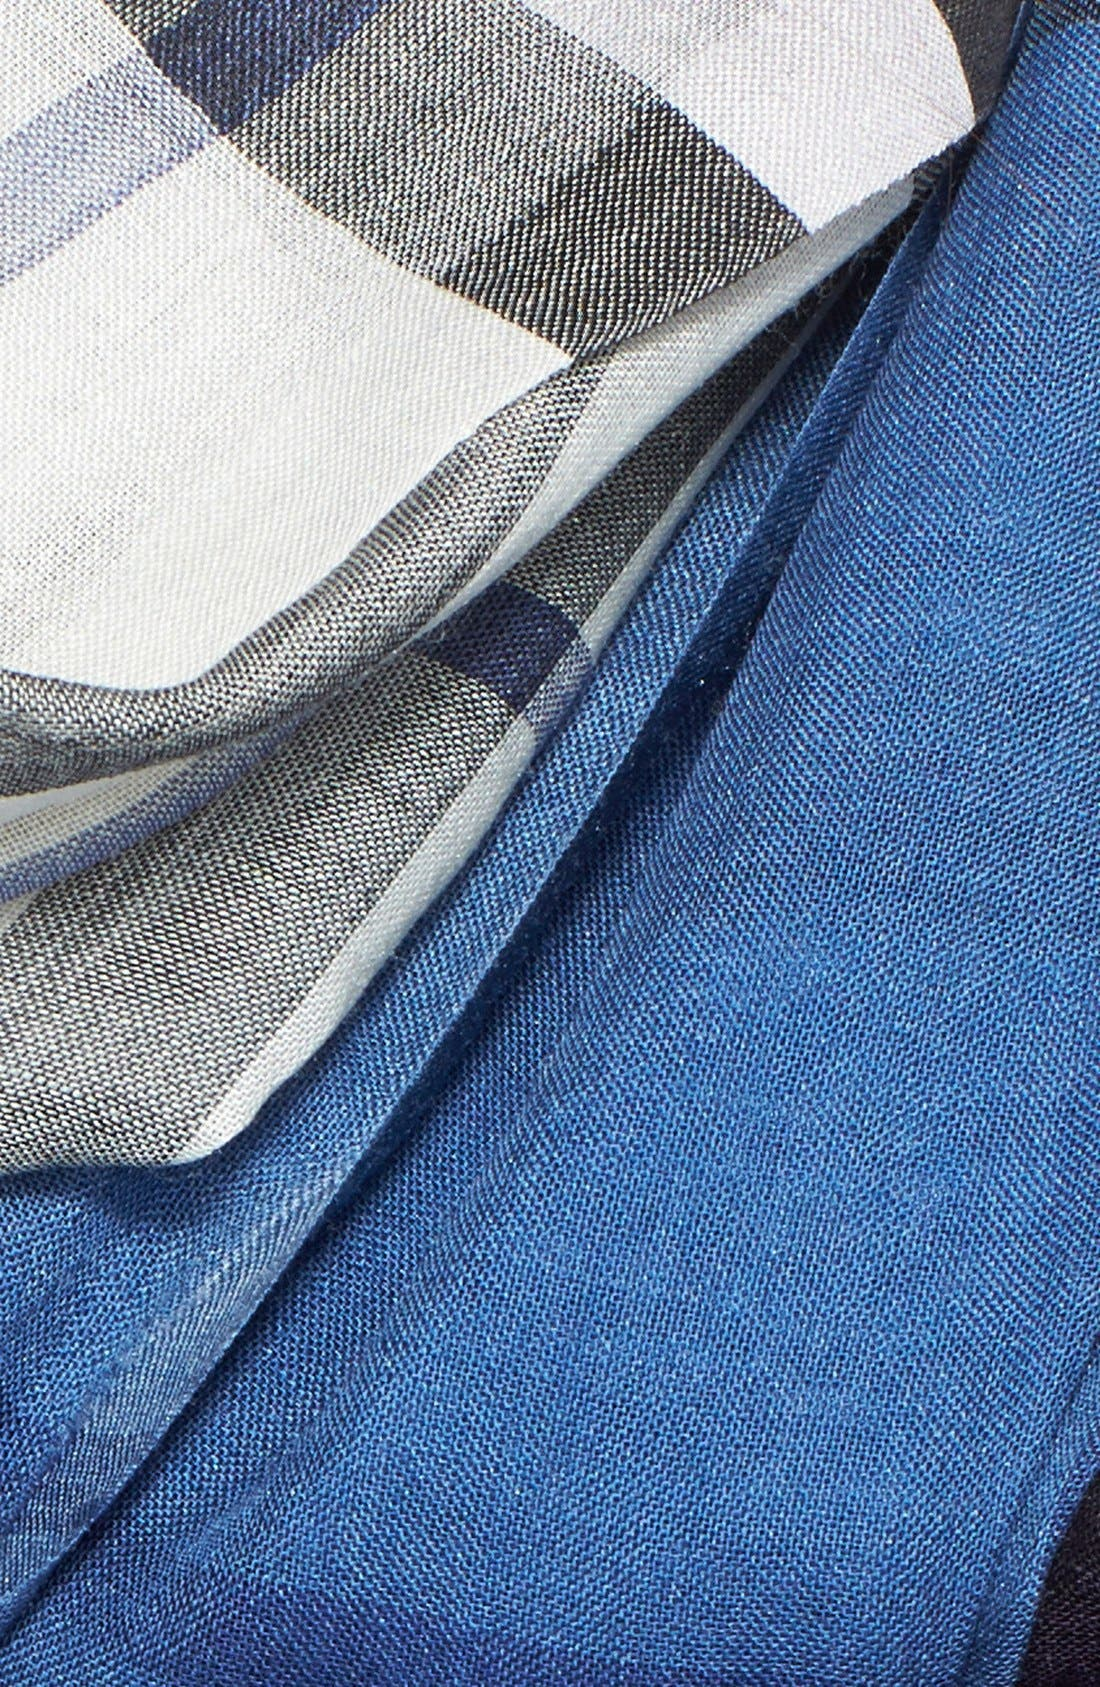 Ombré Check Wool & Silk Scarf,                             Alternate thumbnail 10, color,